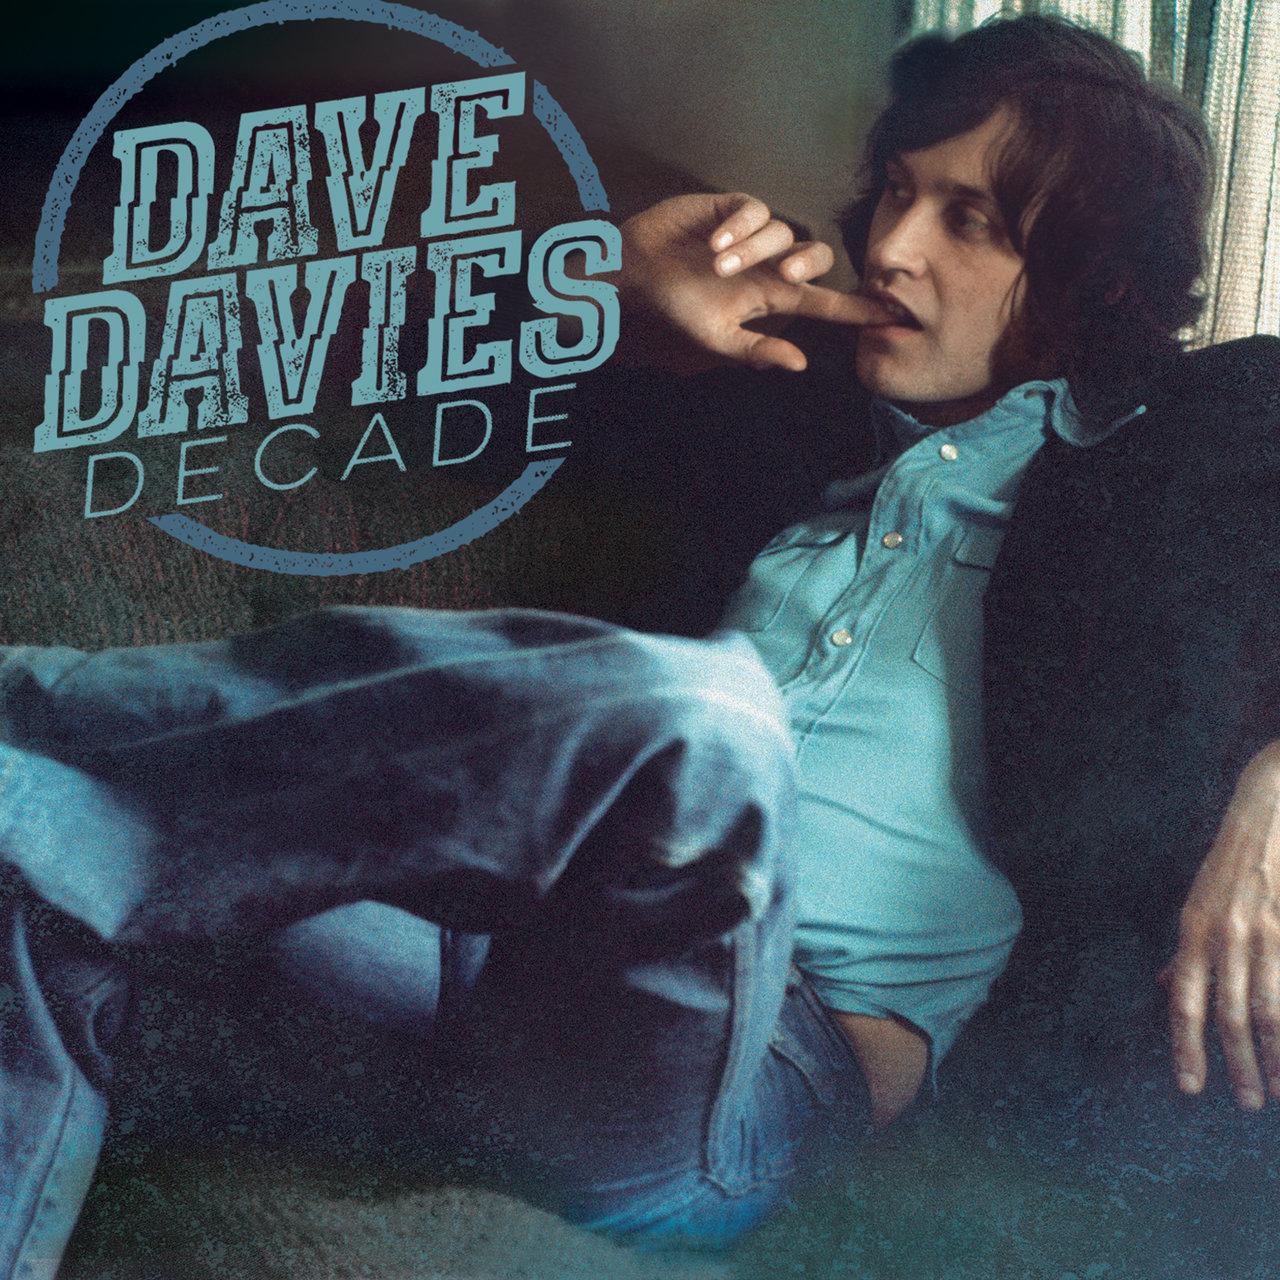 Download Dave Davies – Decade [2018] [320 KBPS][Pradyutvam] Torrent